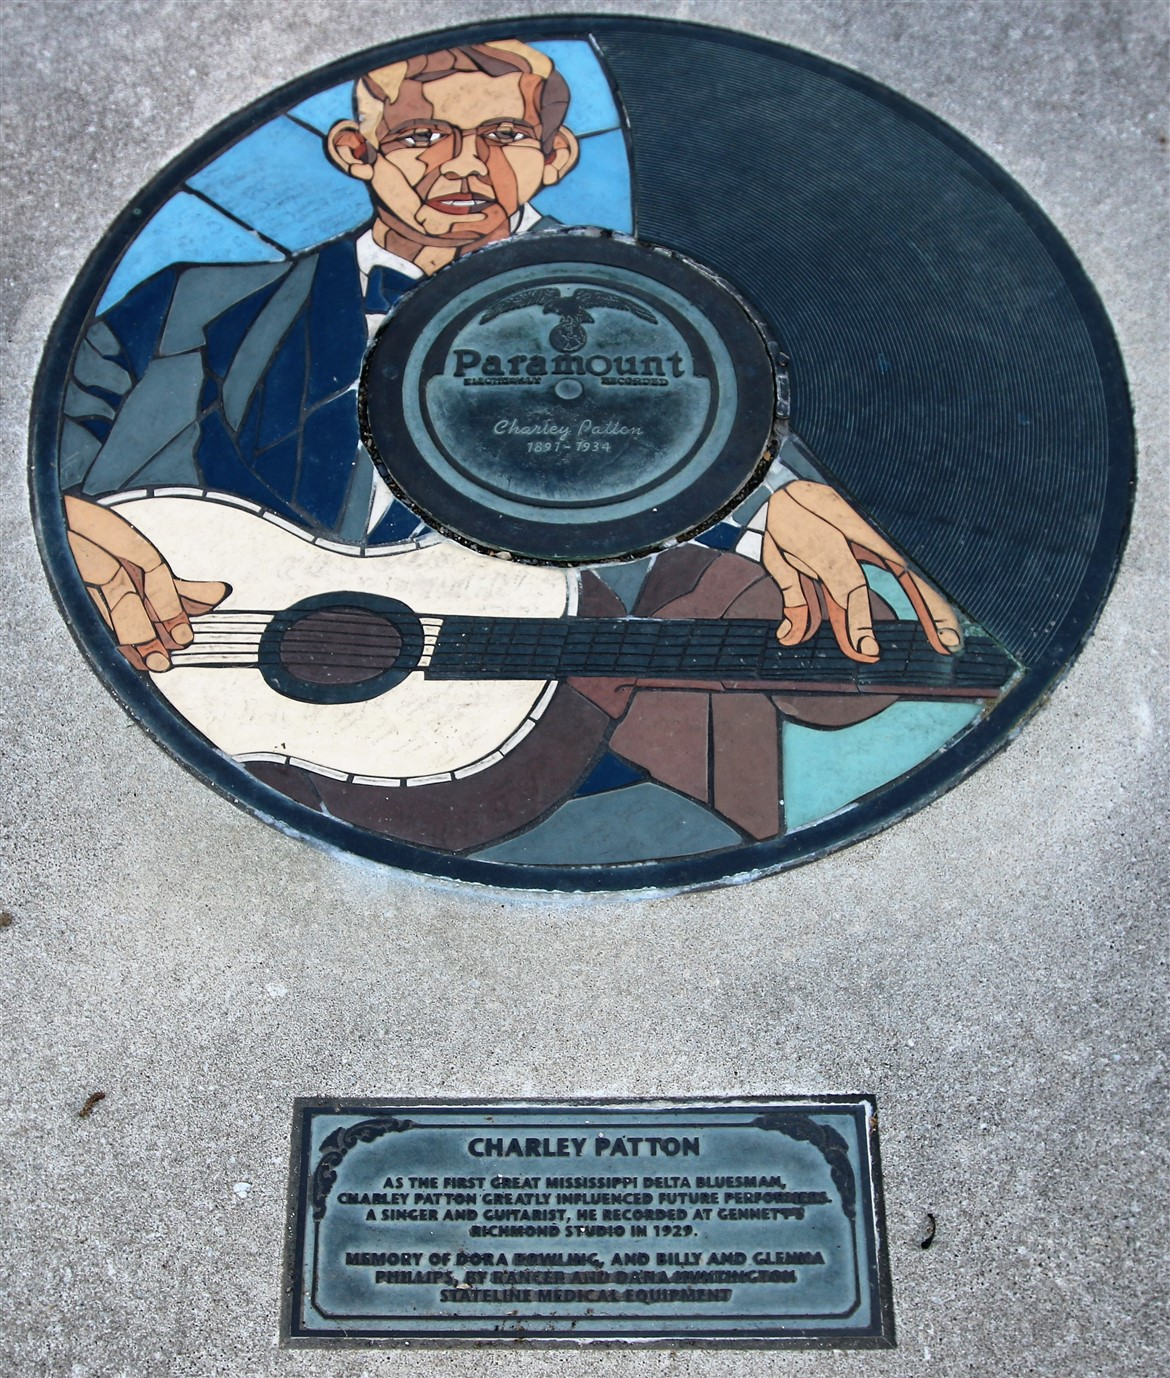 2018 07 17 430  Richmond IN Gennett Records Walk of Fame.jpg